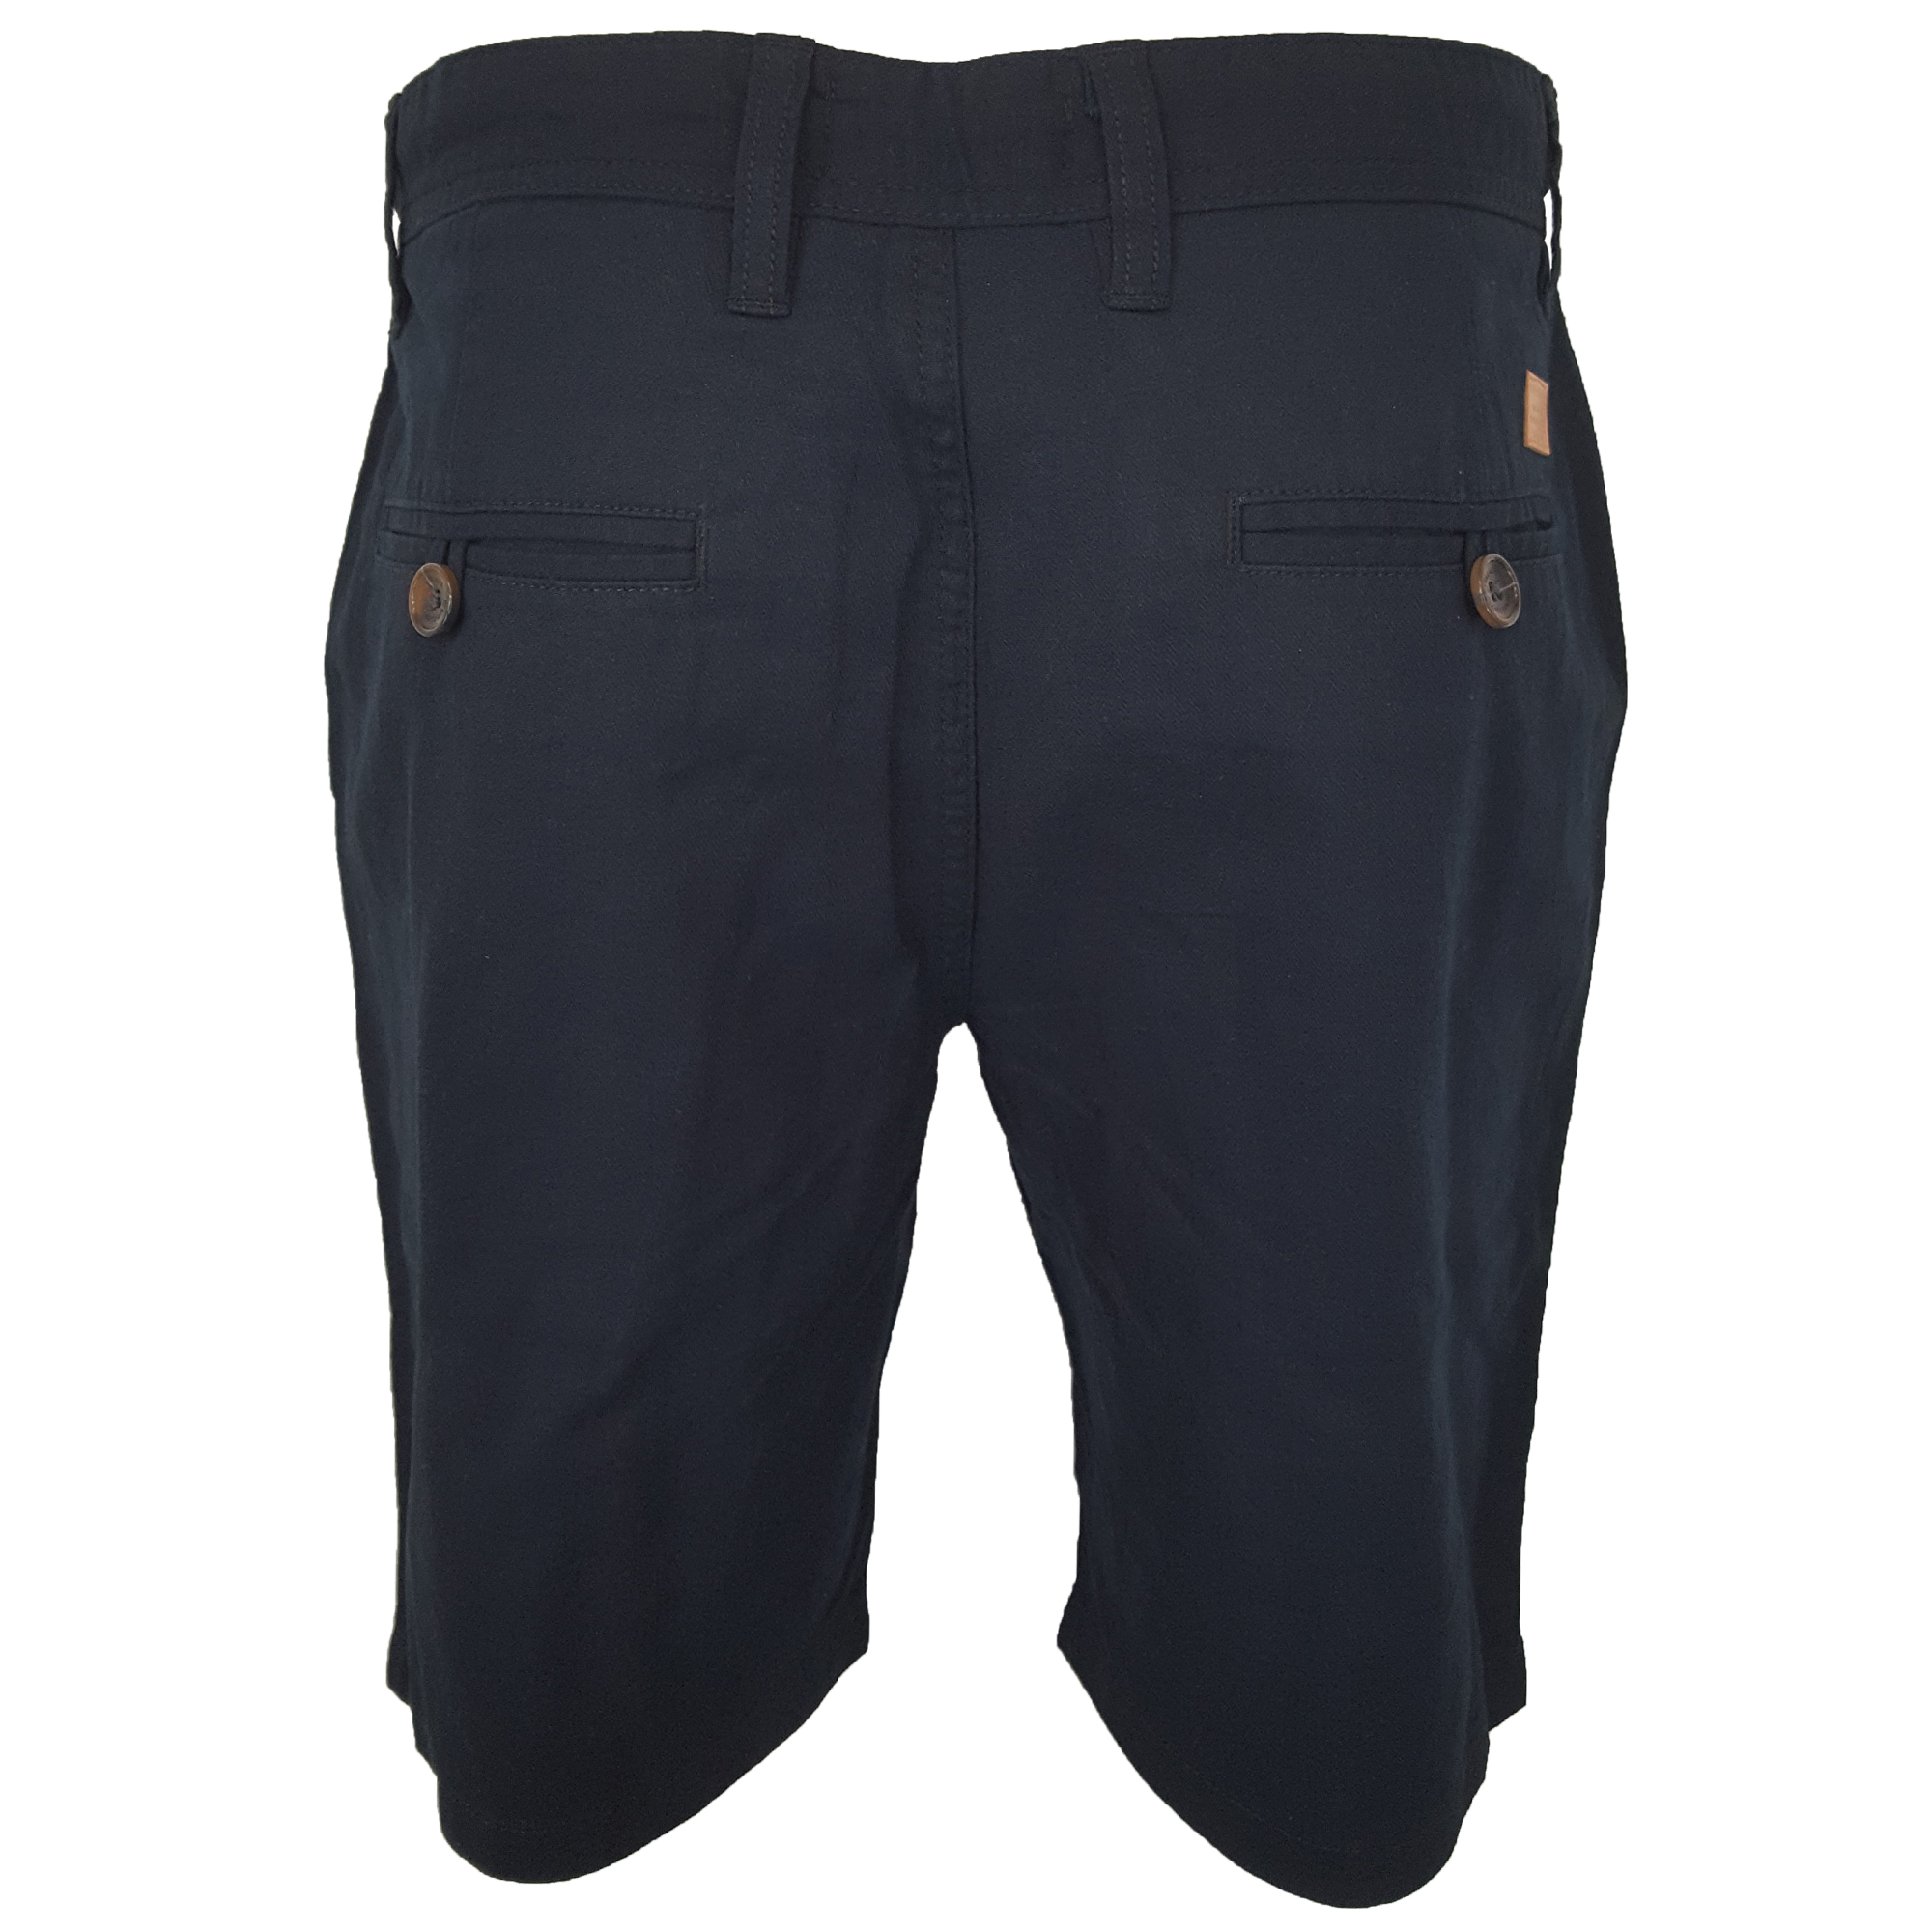 Mens-Linen-Chino-Shorts-Threadbare-Knee-Length-Half-Pants-Casual-Summer-Fashion thumbnail 3